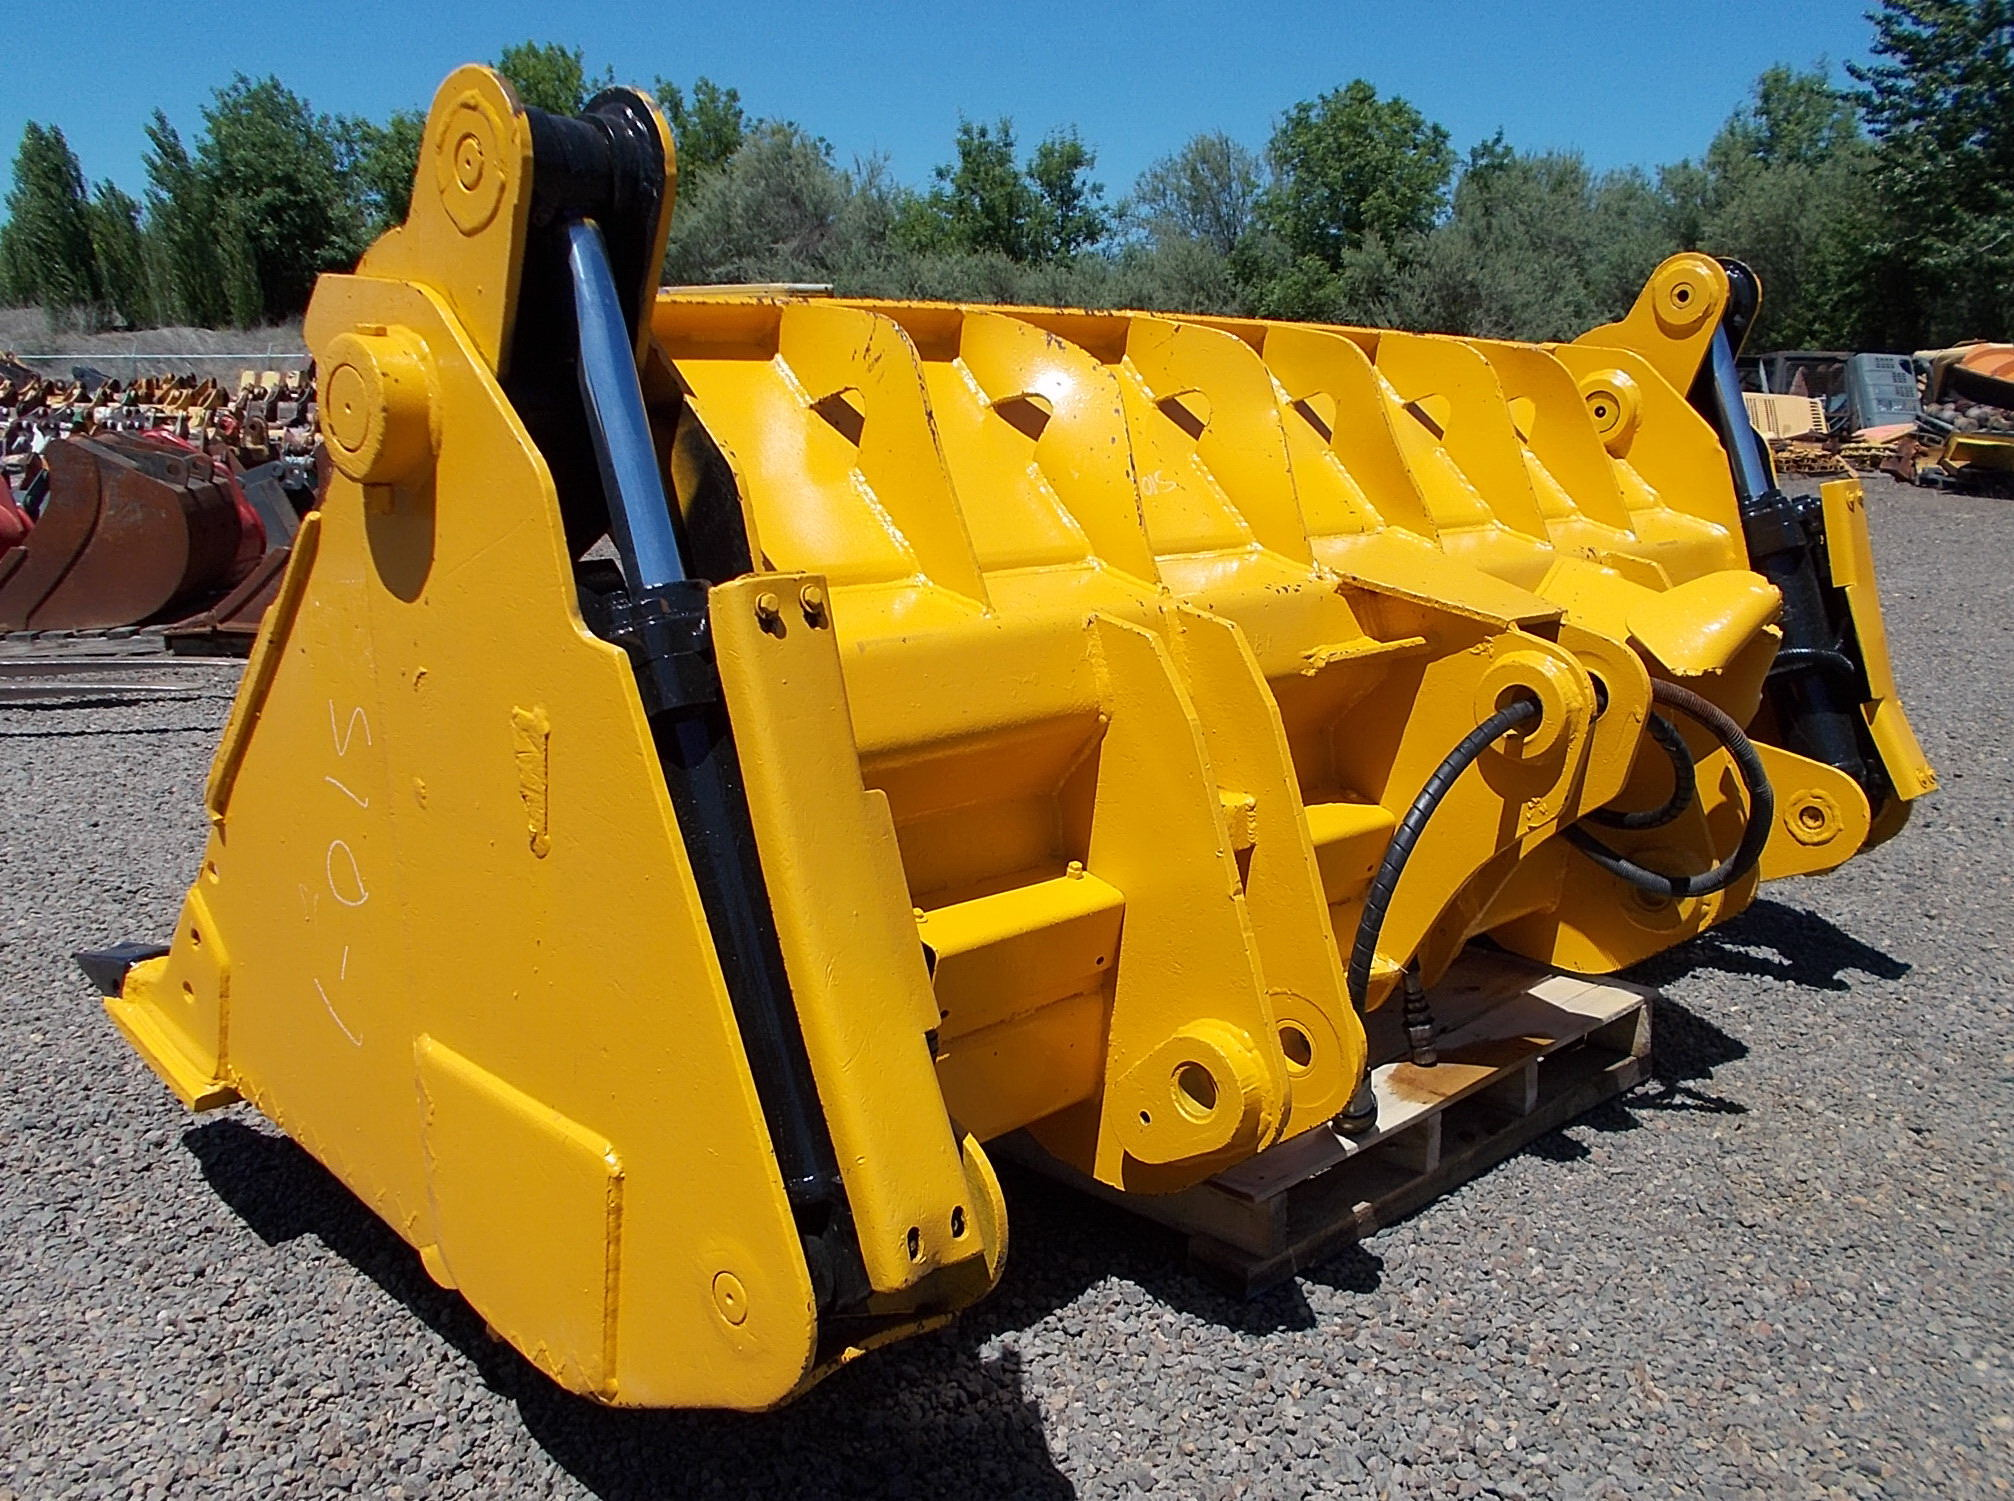 Hunt Tractor - Used 103 John Deere 544E Pin-On 4-1 Loader ...